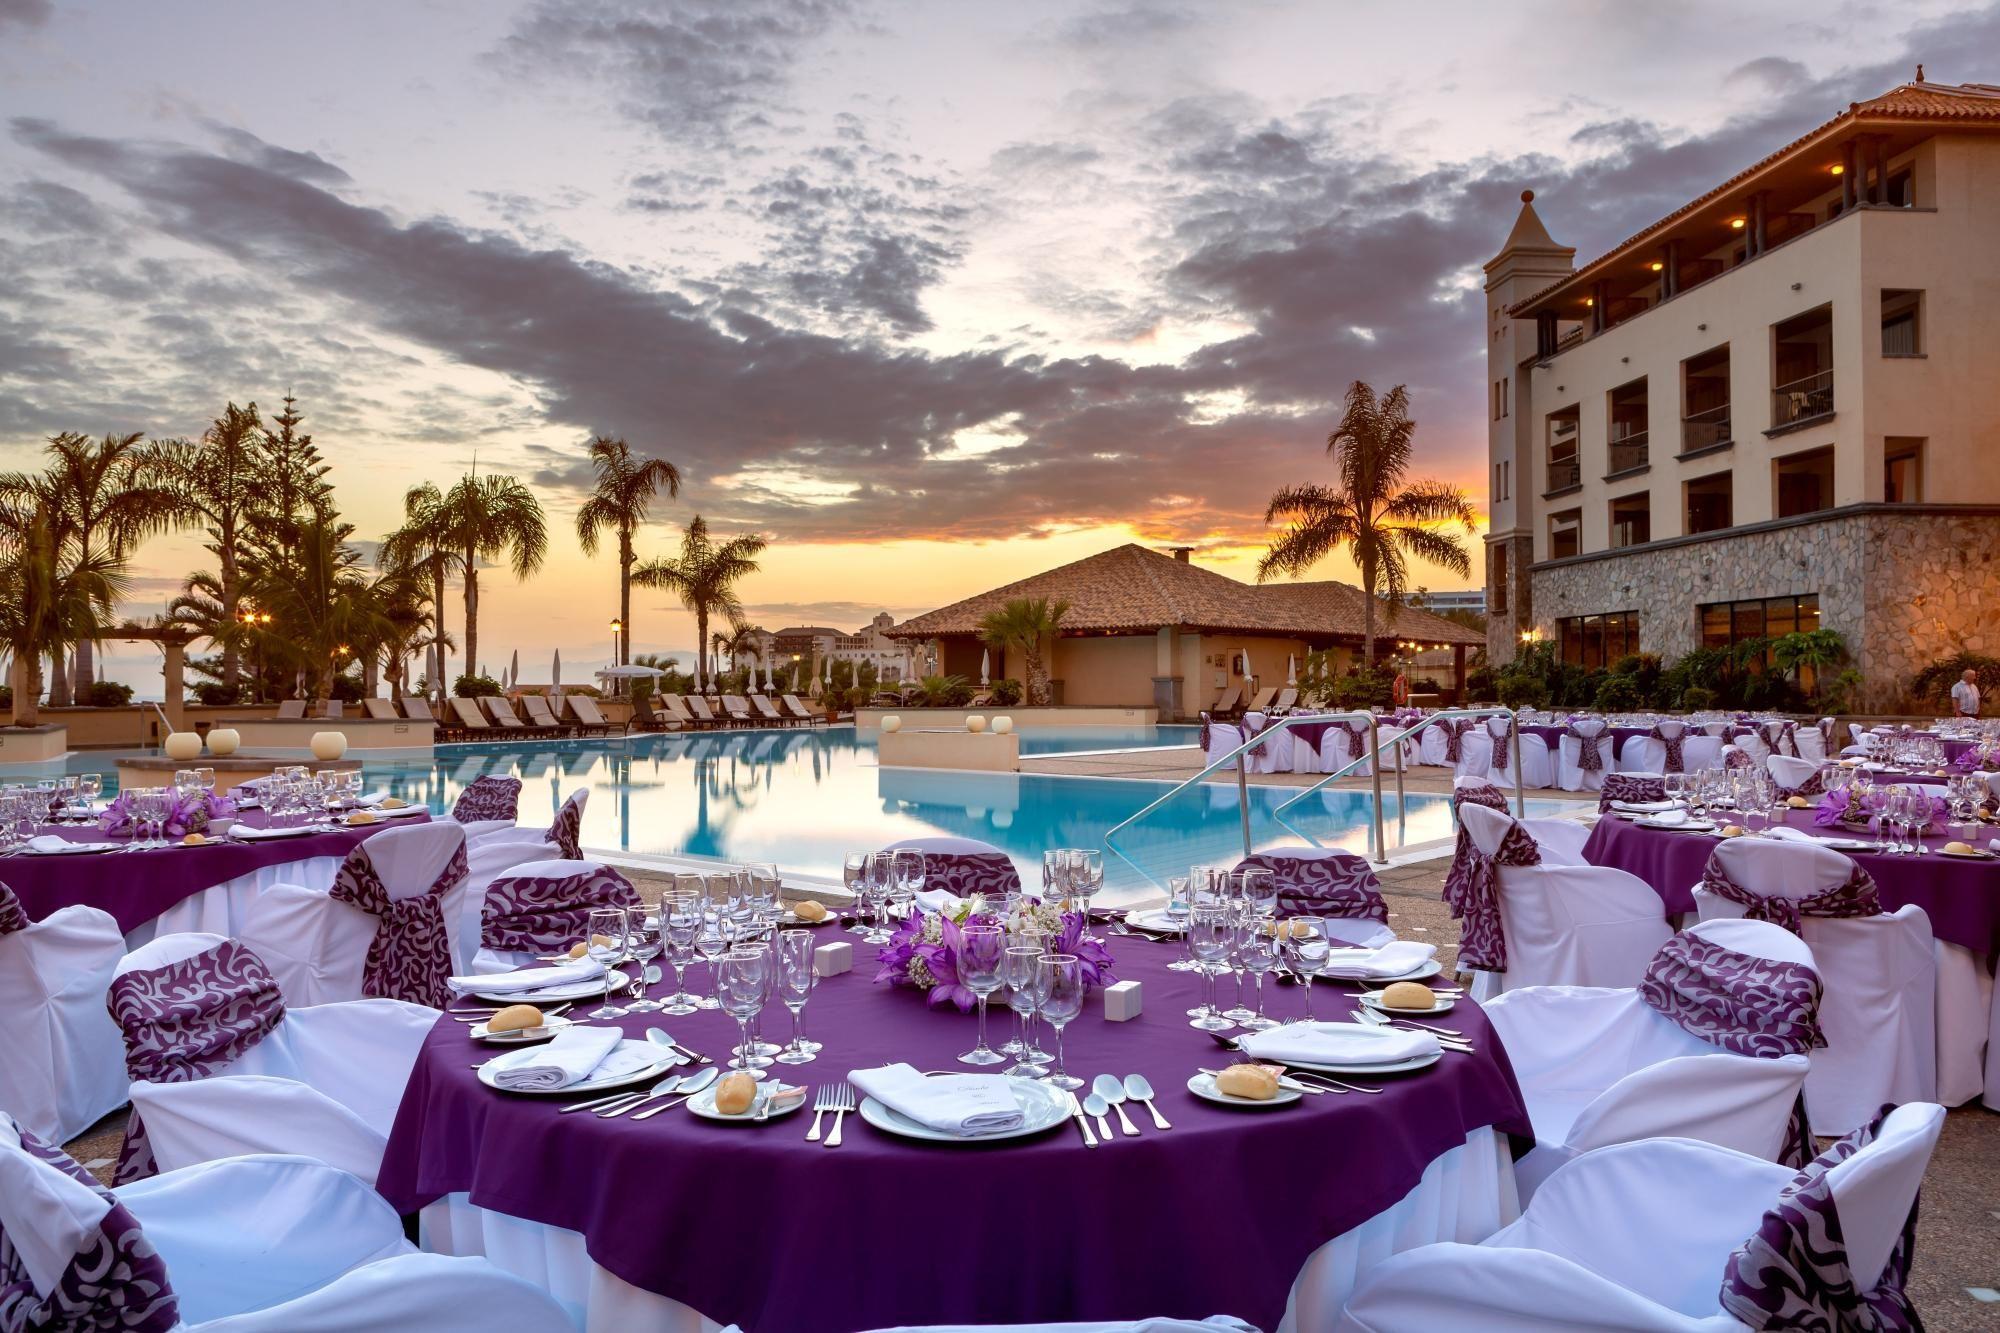 Costa Adeje Costa Adeje Gran Hotel Tenerife Hotel Reviews